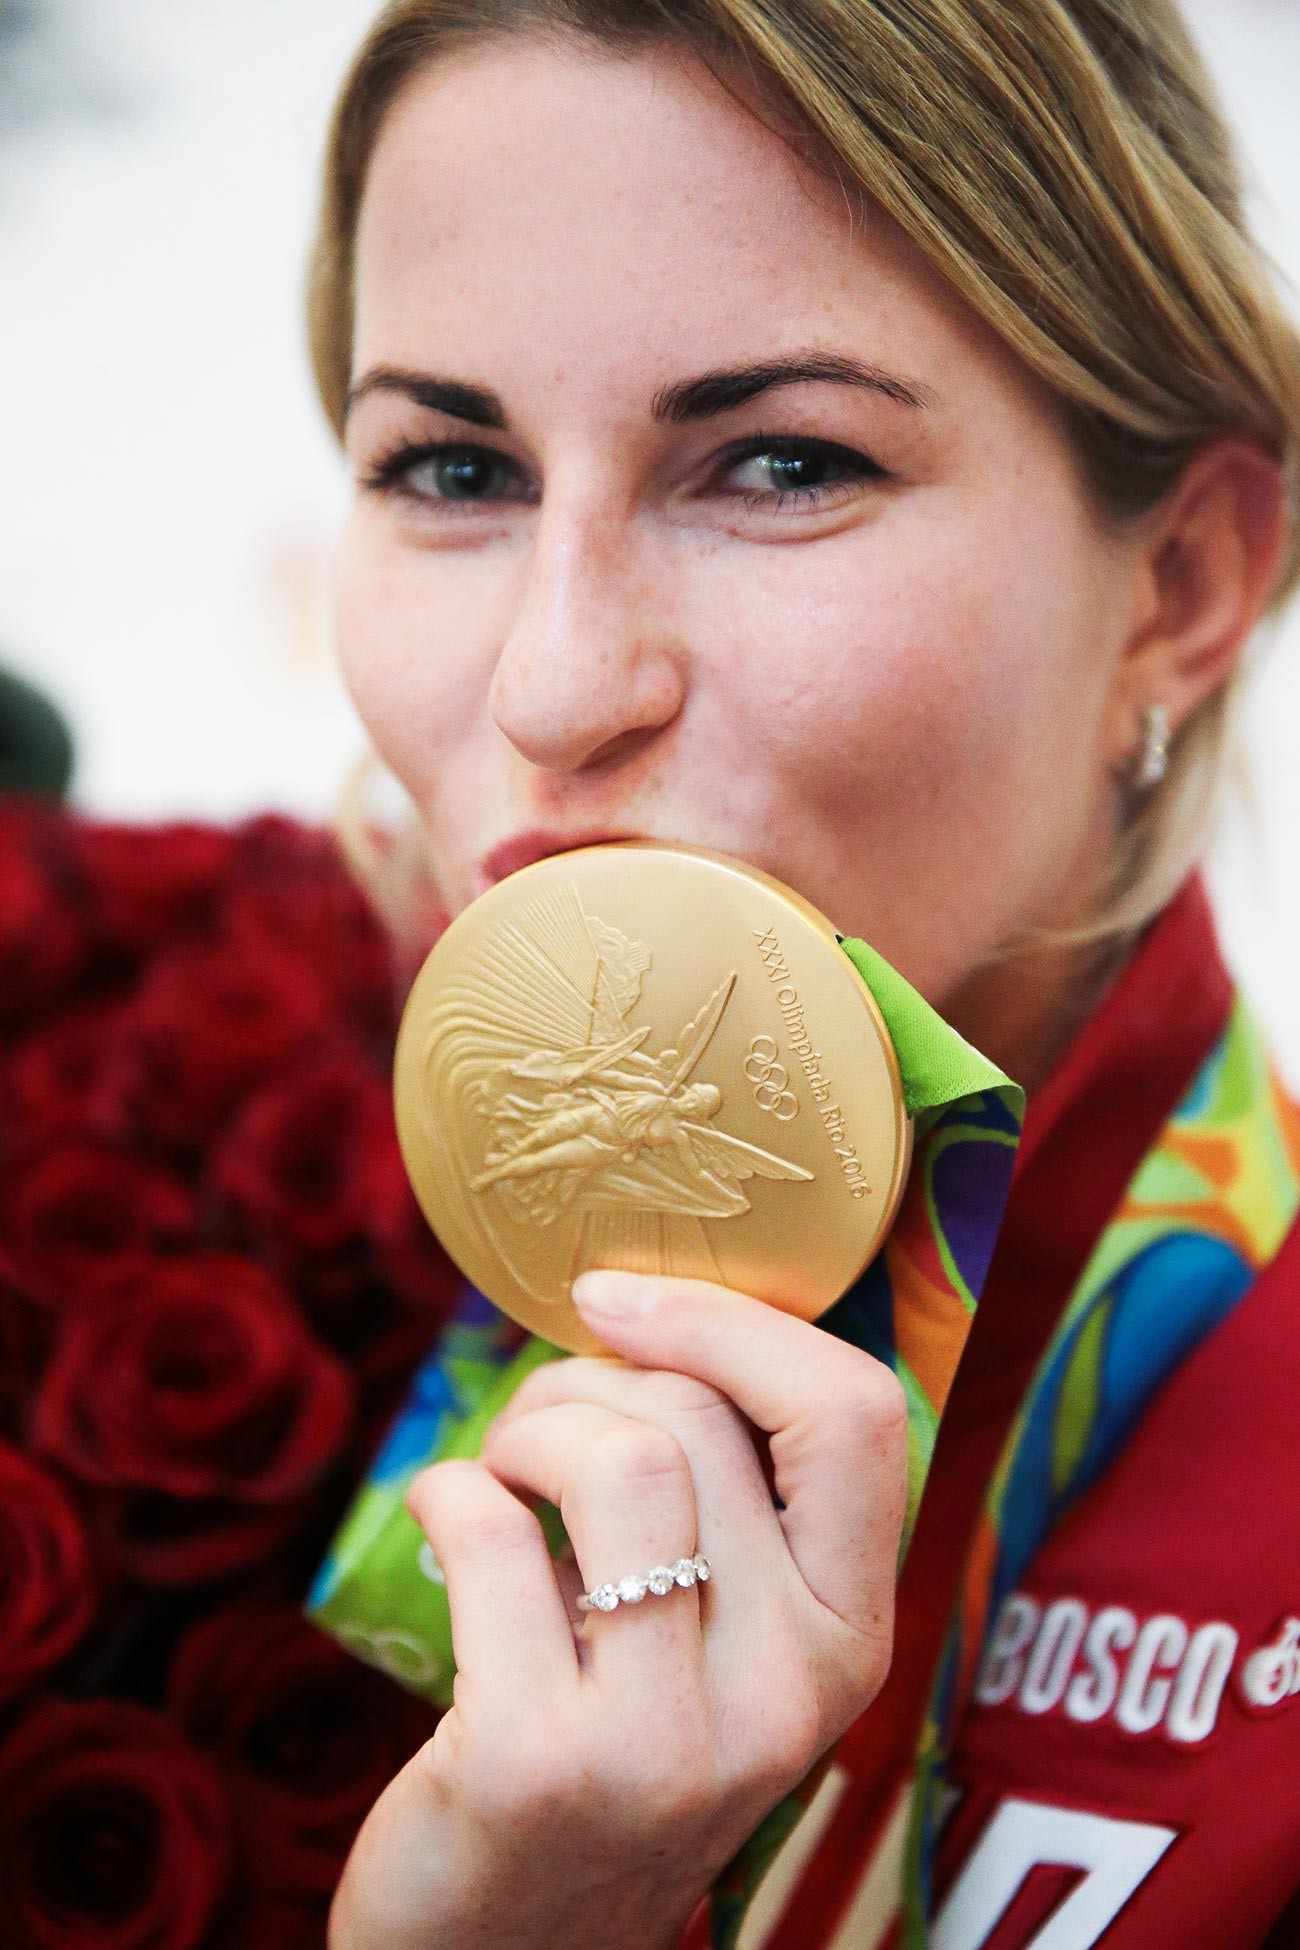 Olympiasiegerin im Florettfechten Inna Deriglasowa am Flughafen Scheremetjewo.